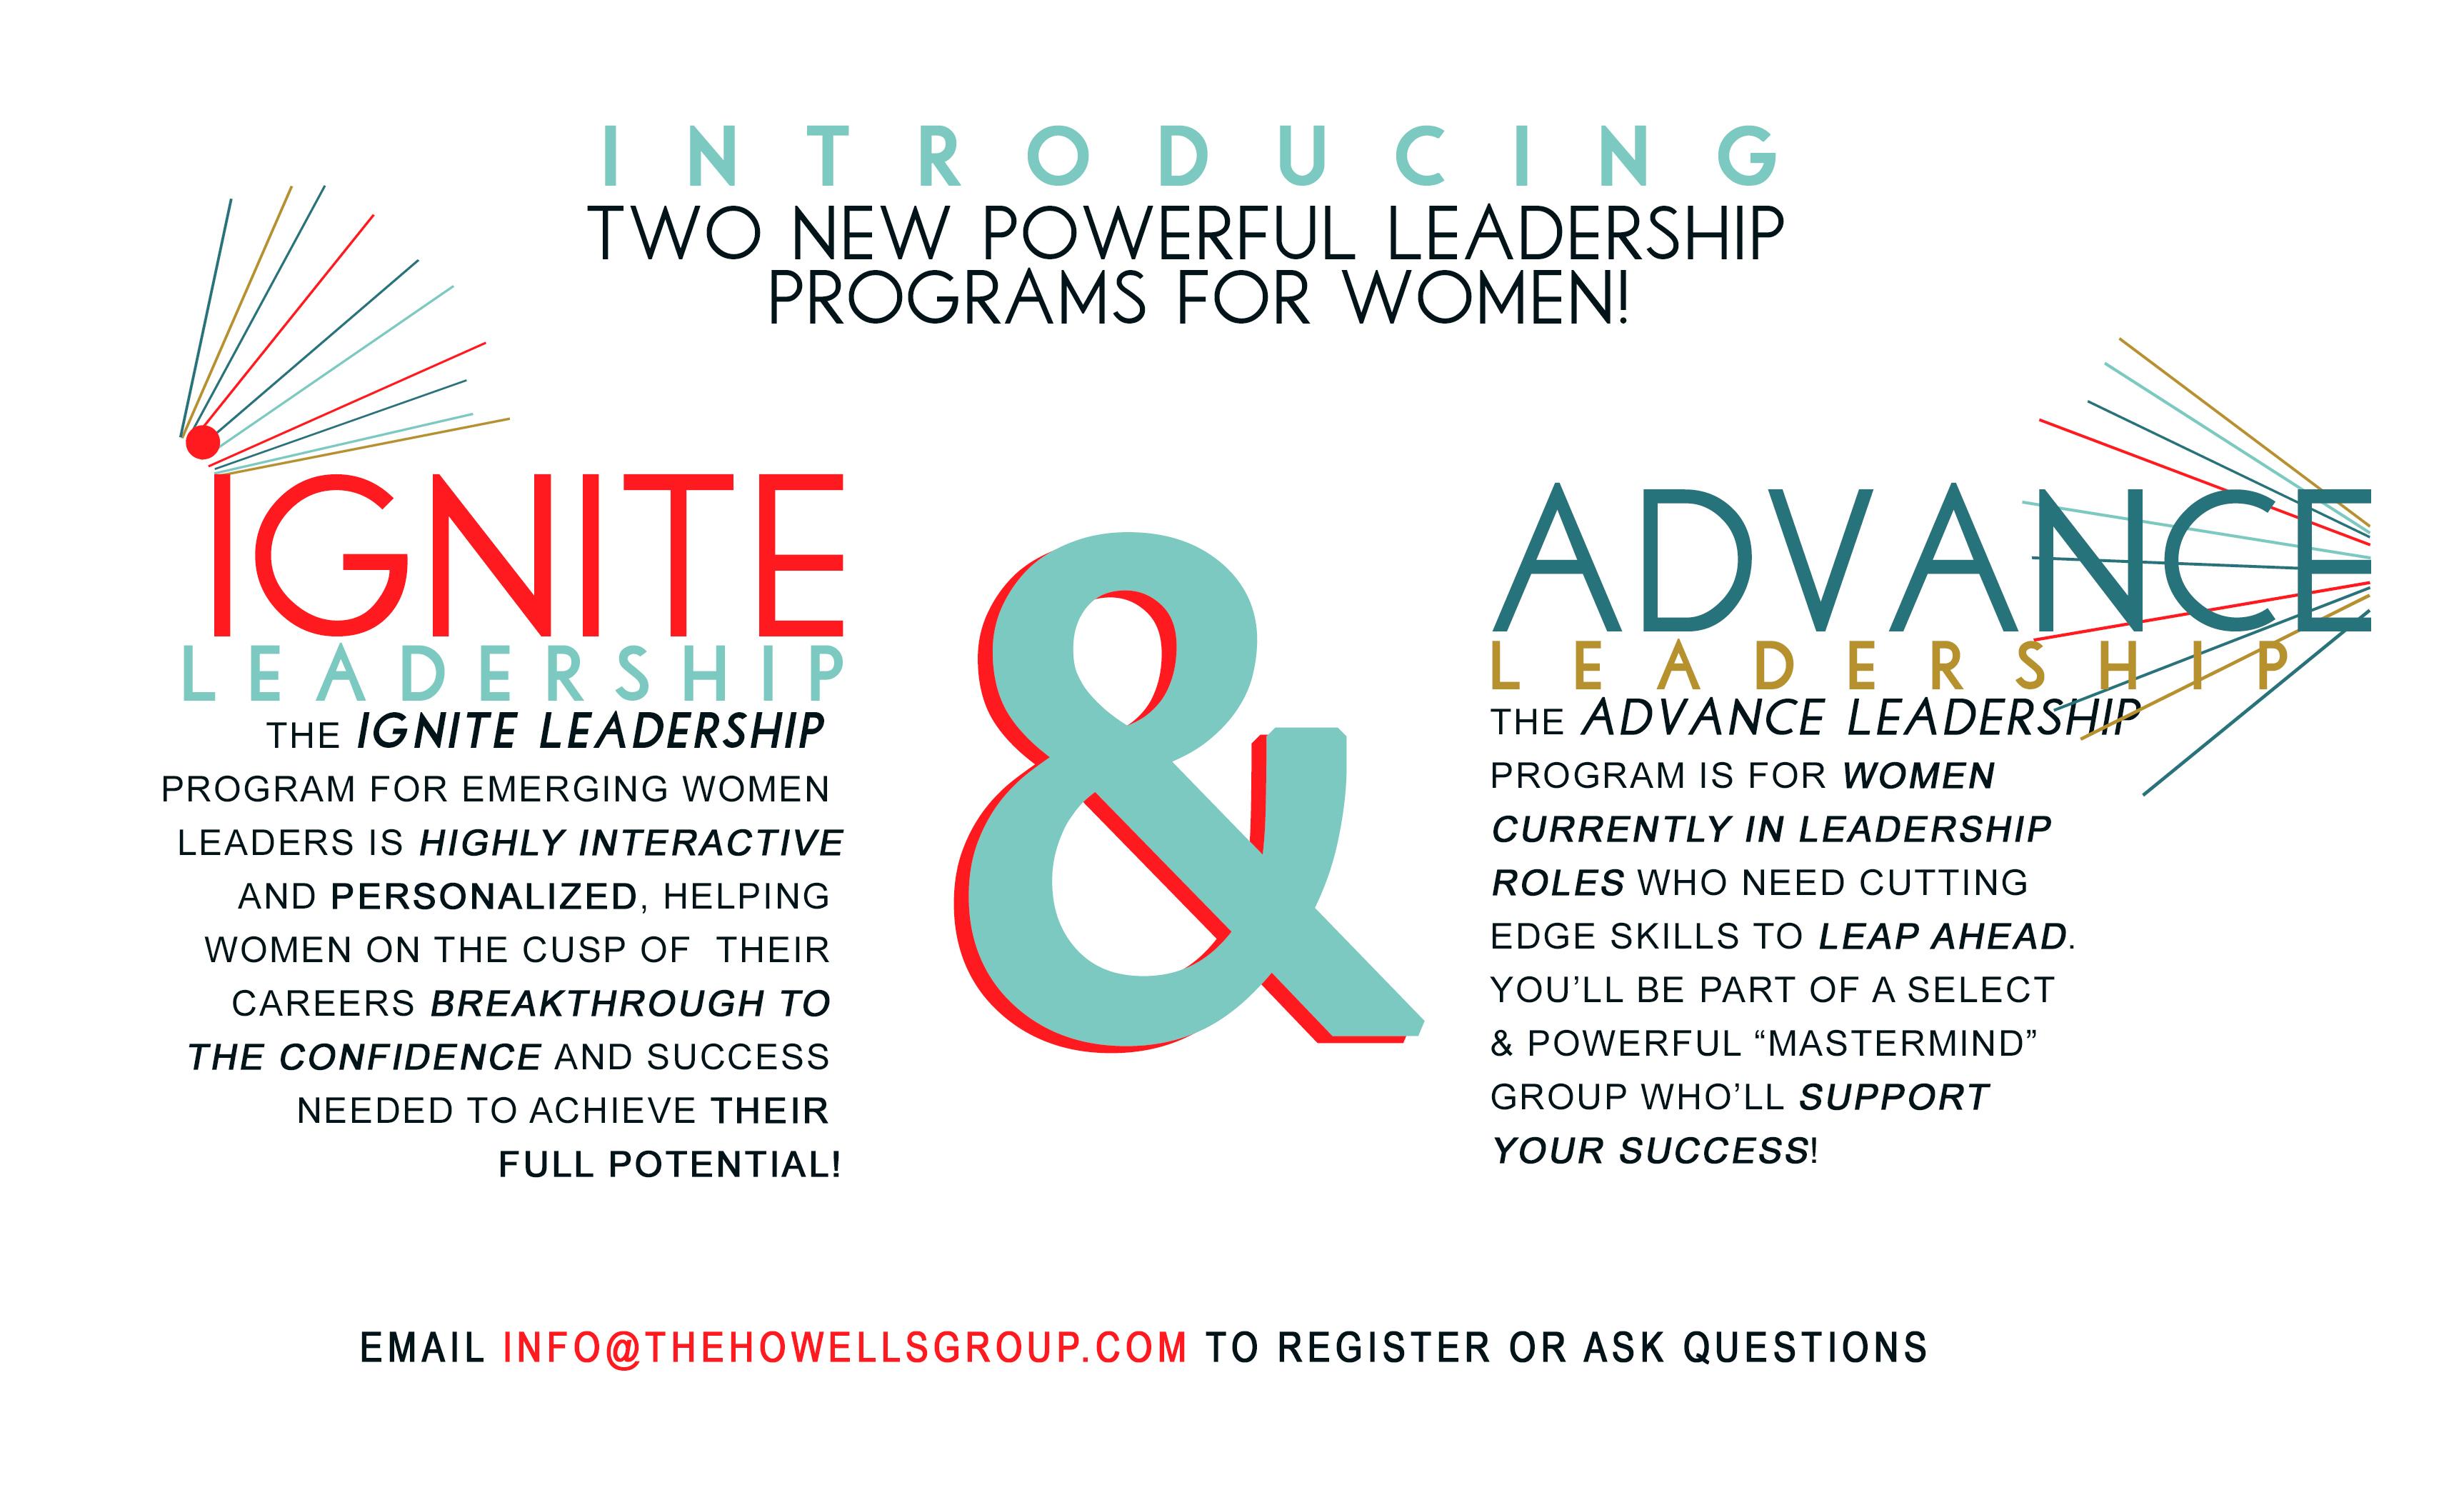 leadership Program, Women, Ignite Advance, expand your leadership, leadership agility, workshop, seminar, program, Oregon, womens leadership, Portland Oregon